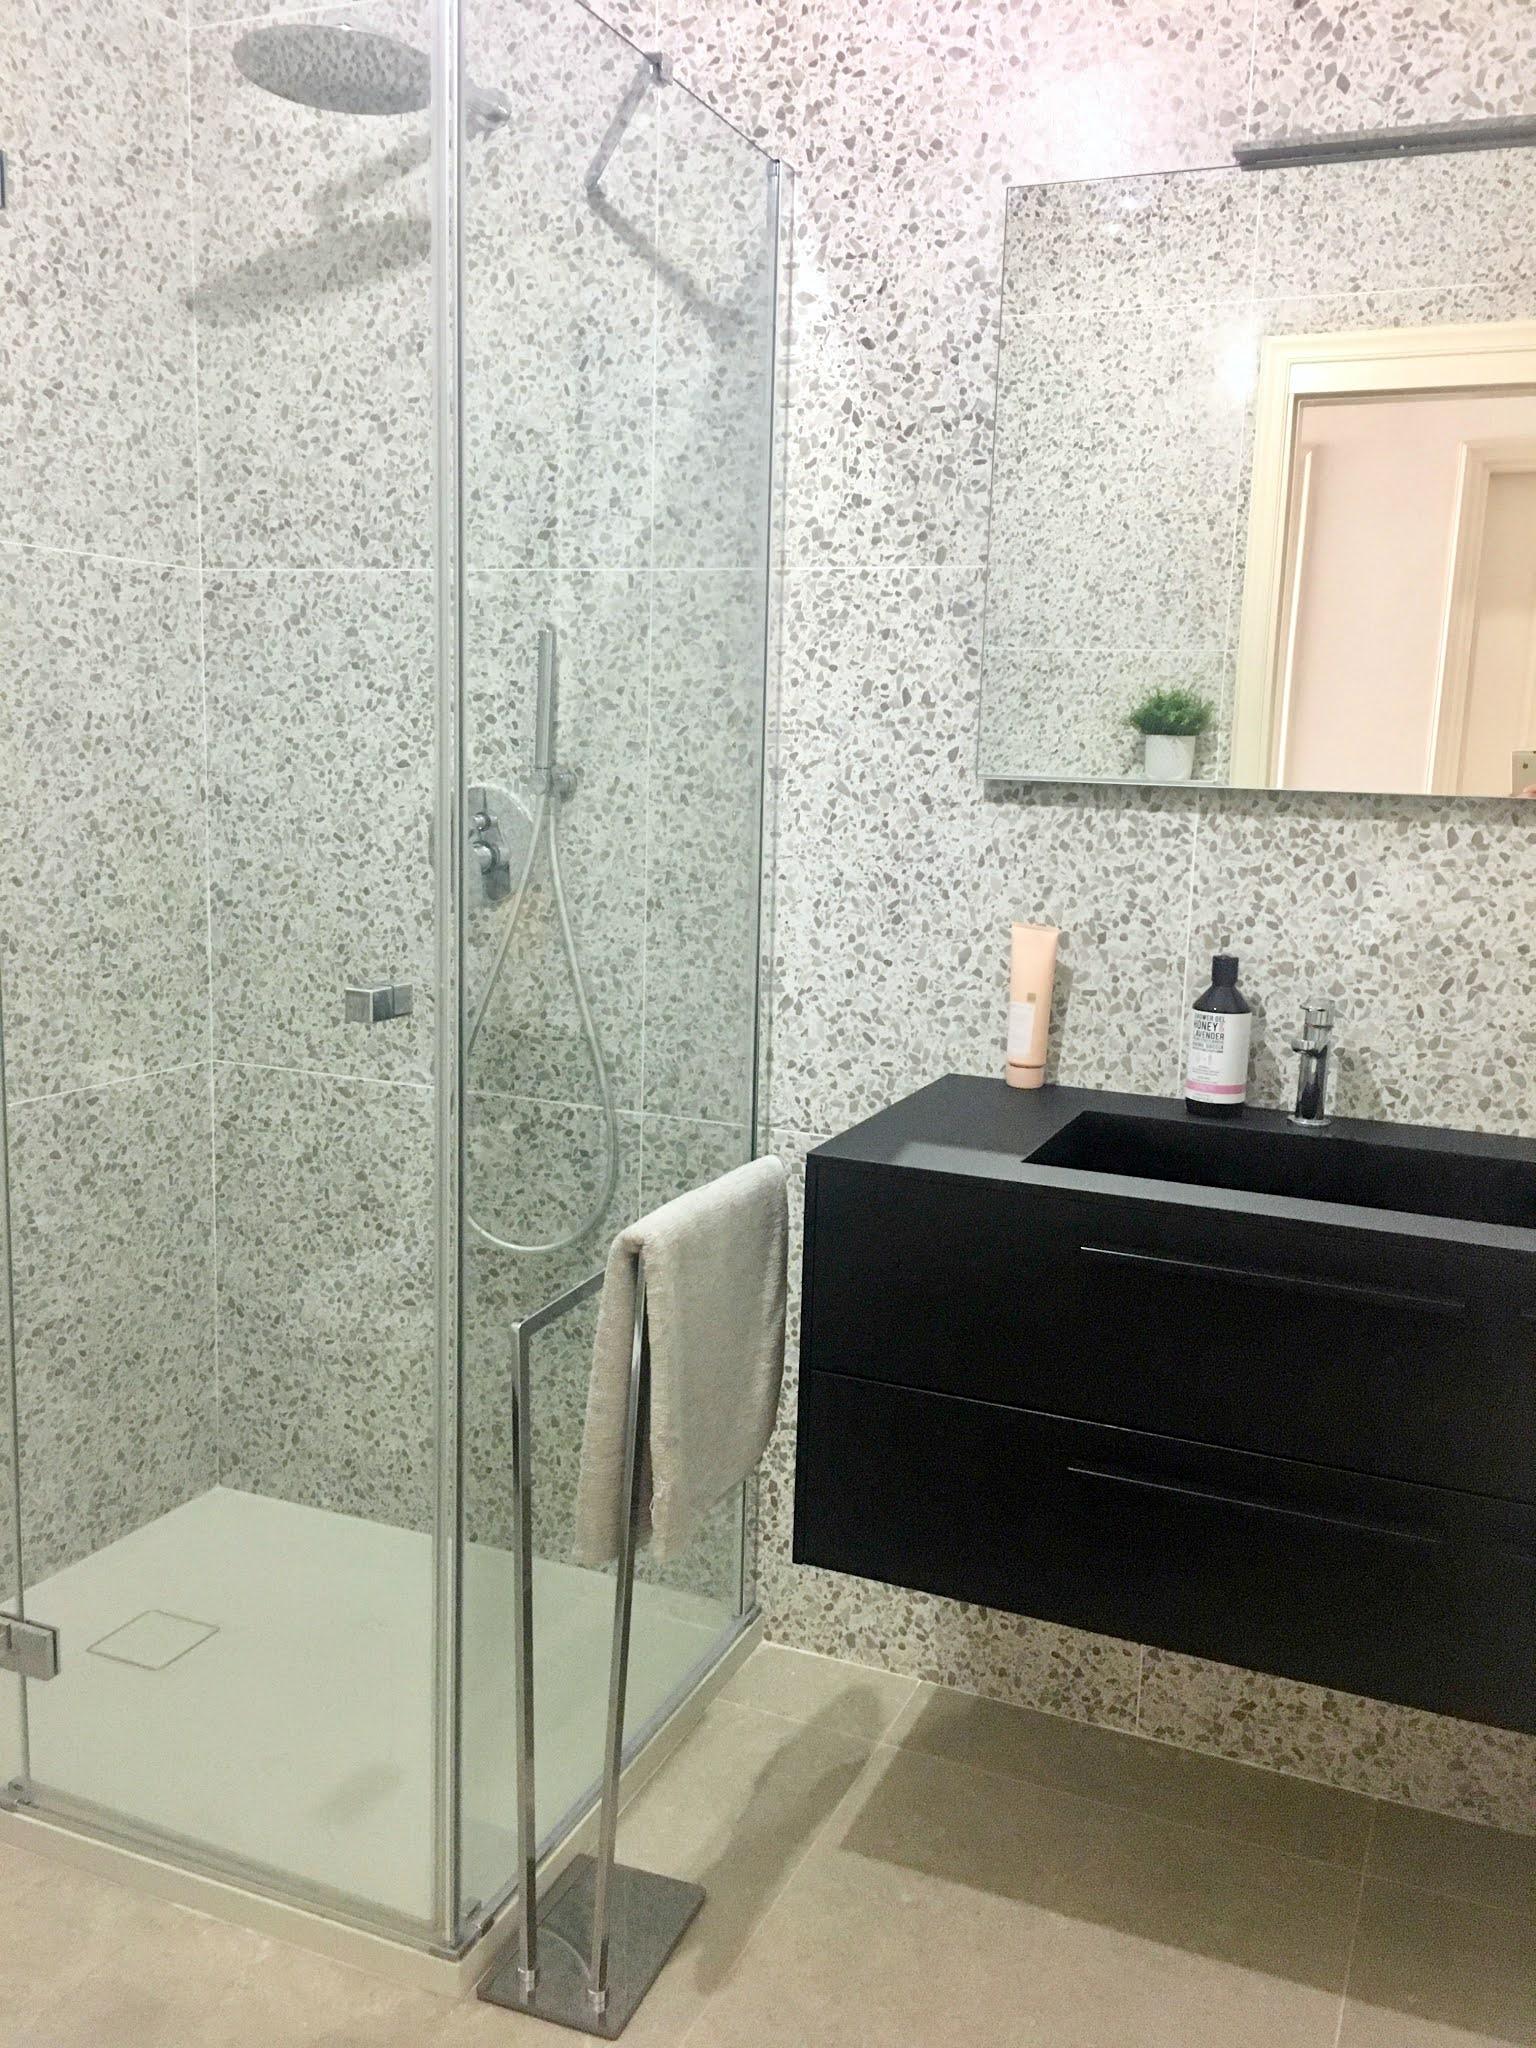 Bathroom shower terrazzo grey tile